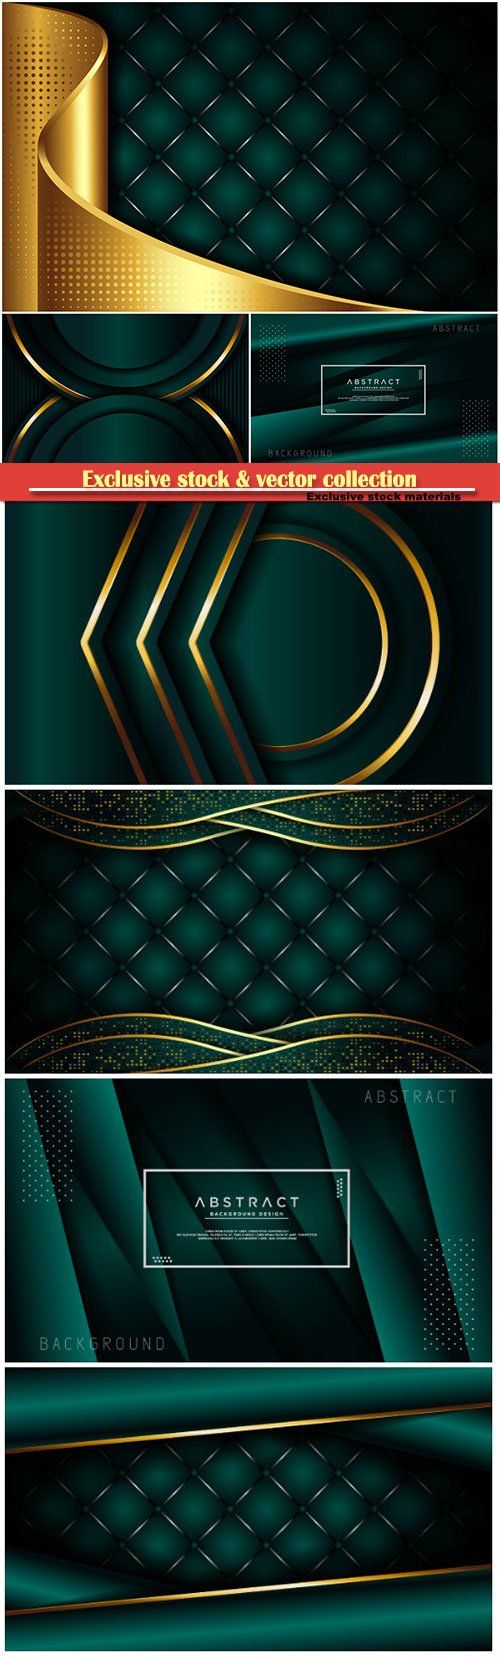 Luxury dark green background with overlap layer